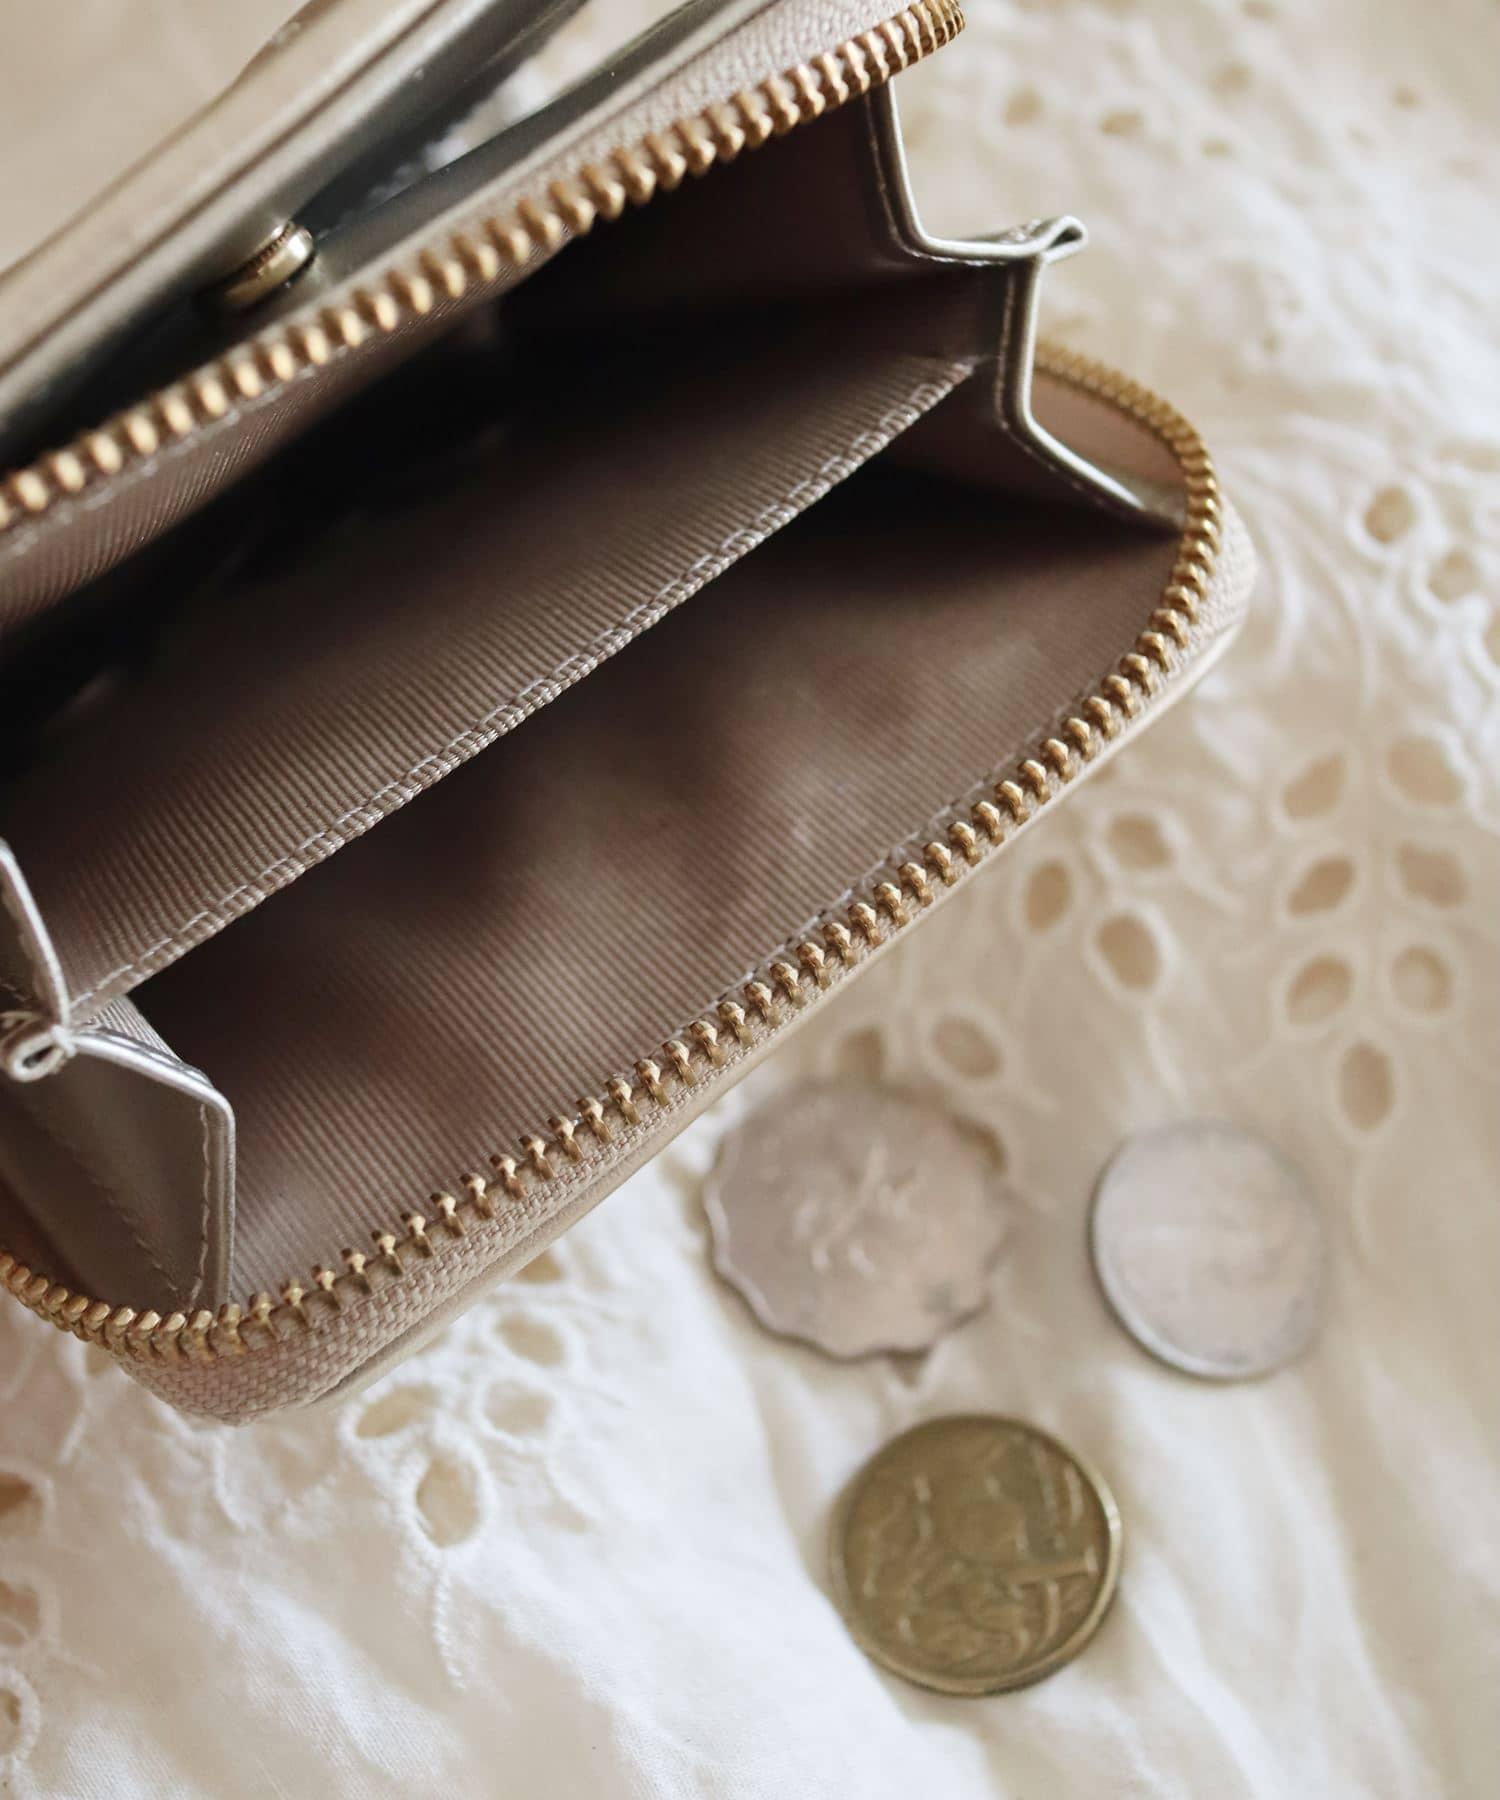 BIRTHDAY BAR(バースデイバー) スマイルキルティング 2つ折り財布